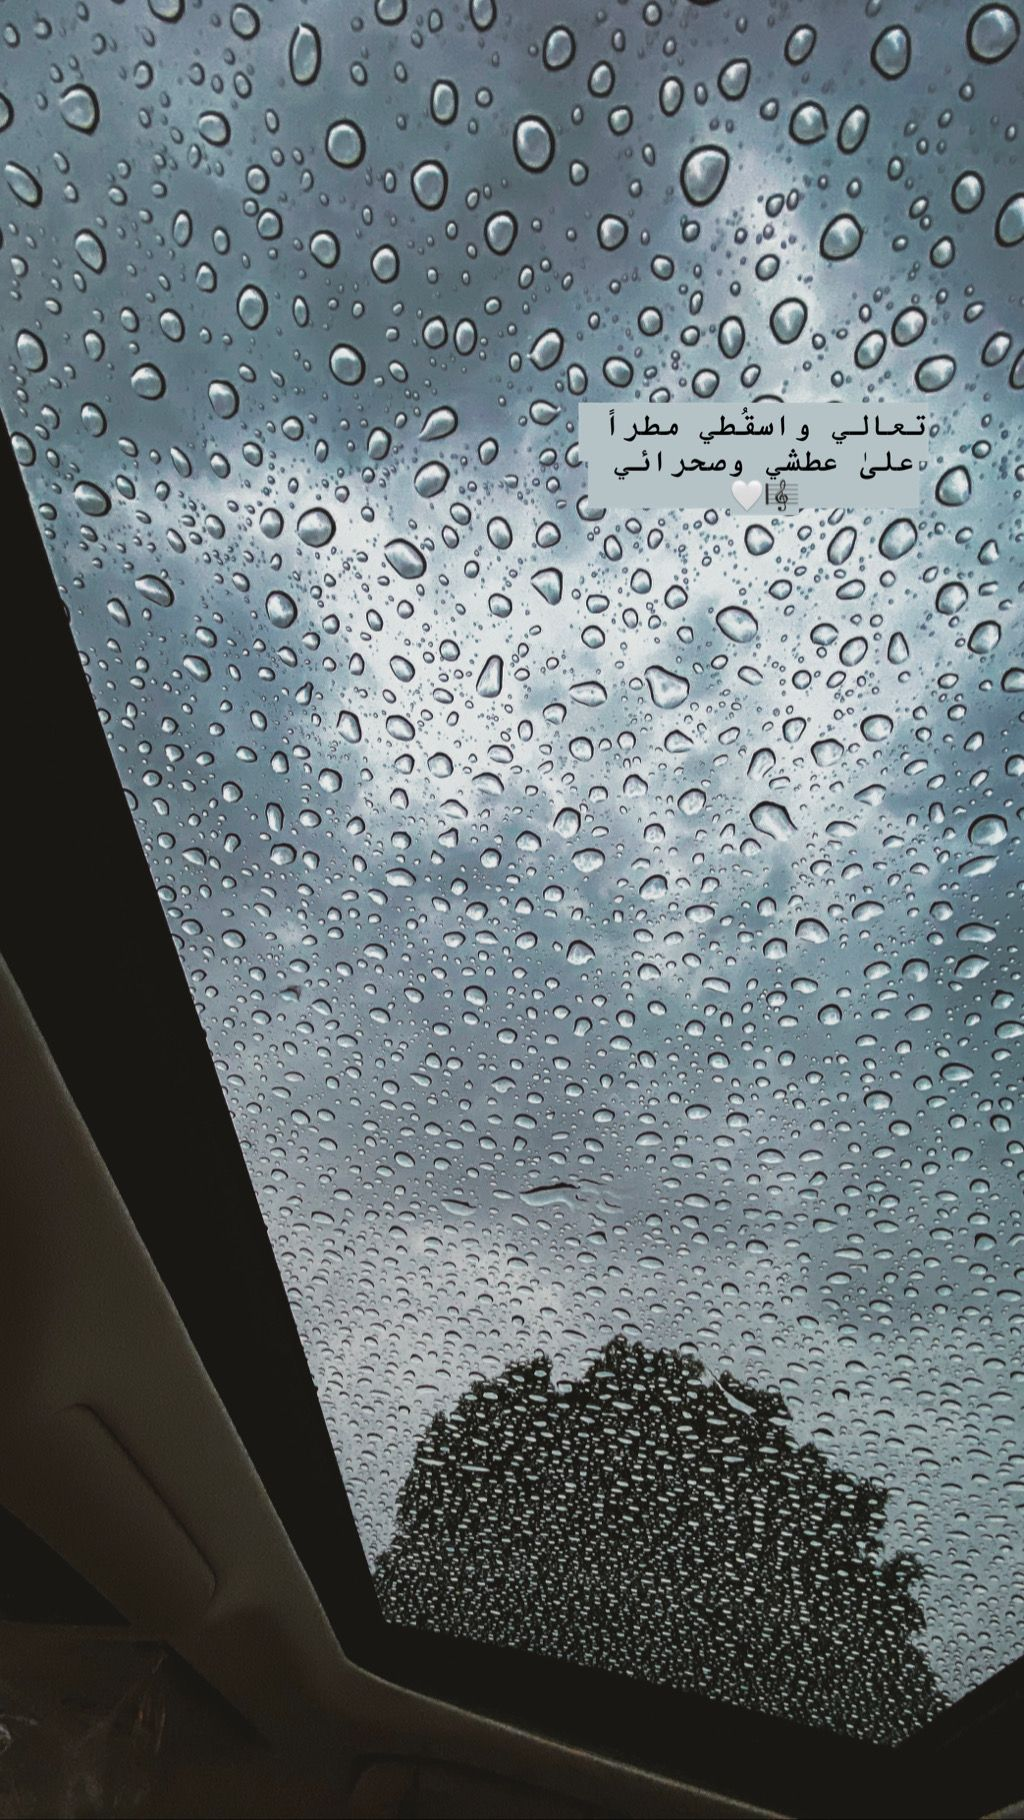 دبي Fashion Art شتاء مطر ليل كاظم الساهر طرب Night Dubai Winter Rain Iphone11pro Iphone Flying Bird Silhouette Rain And Coffee Bird Silhouette